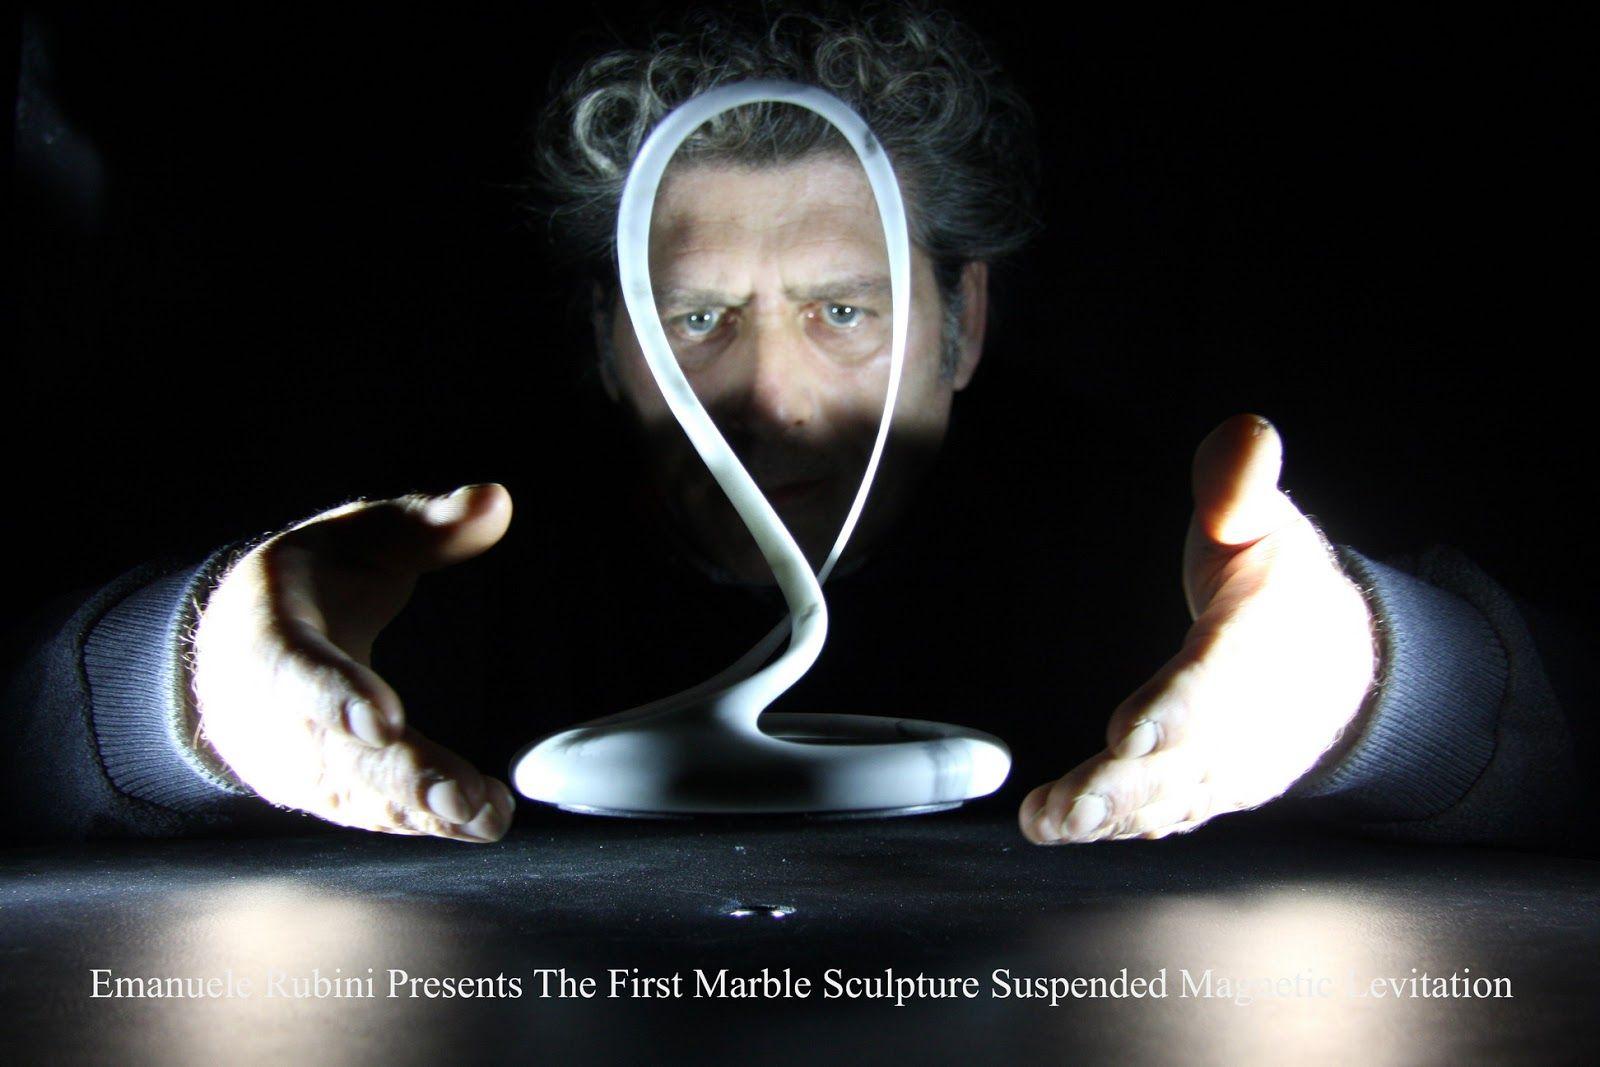 Emanuele Rubini Presenta la Prima Scultura In Marmo Sospesa a Levitazione magnetica